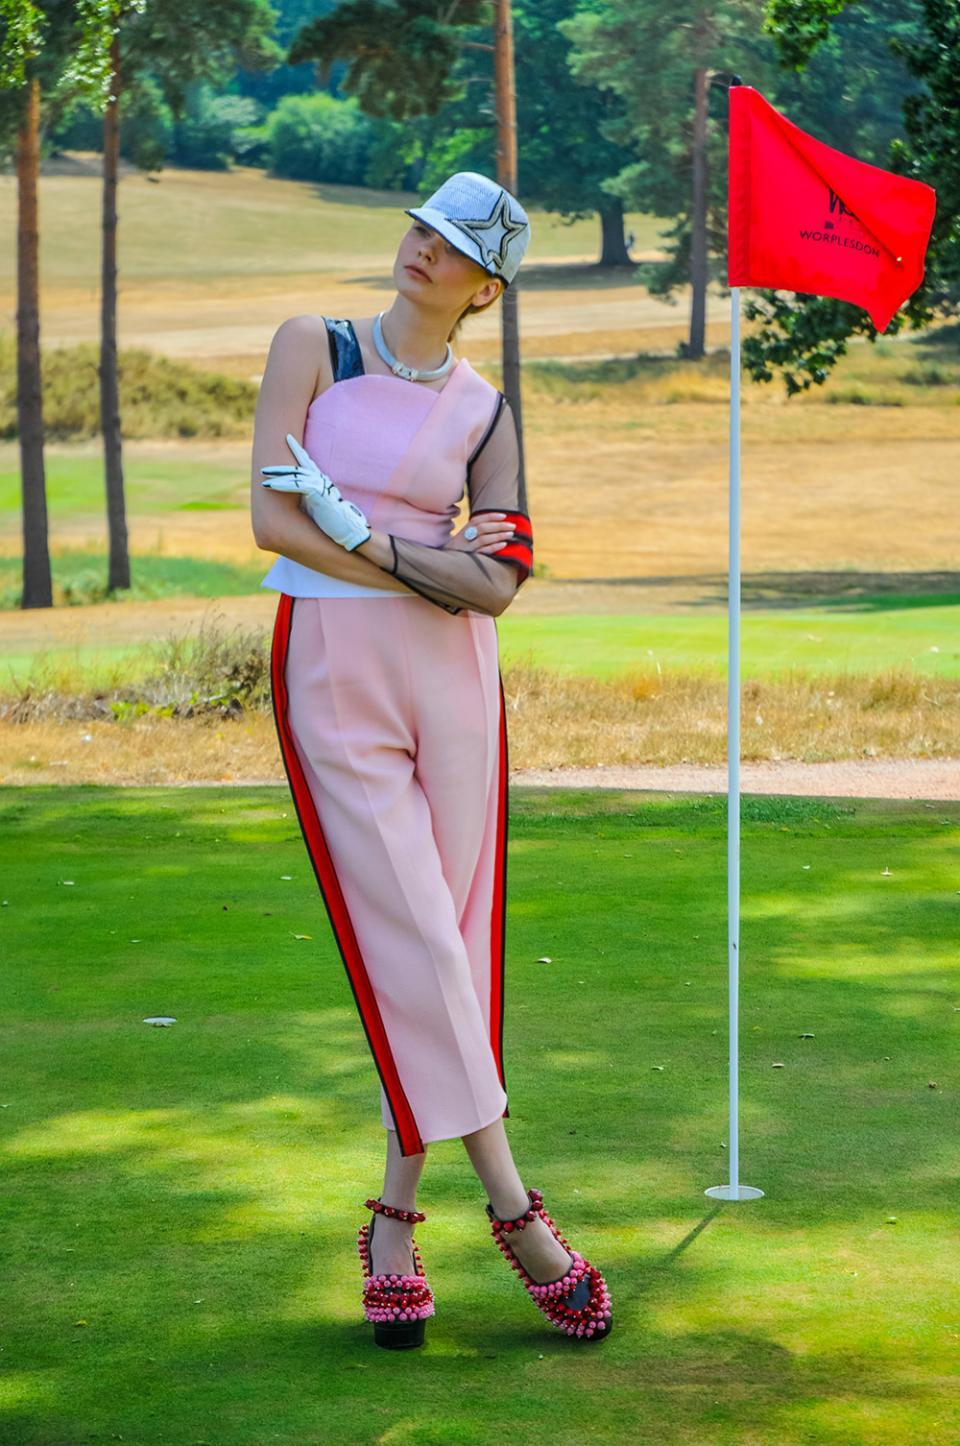 Ferrari 488 Supercar Women's Fashion Pink Suit Golf